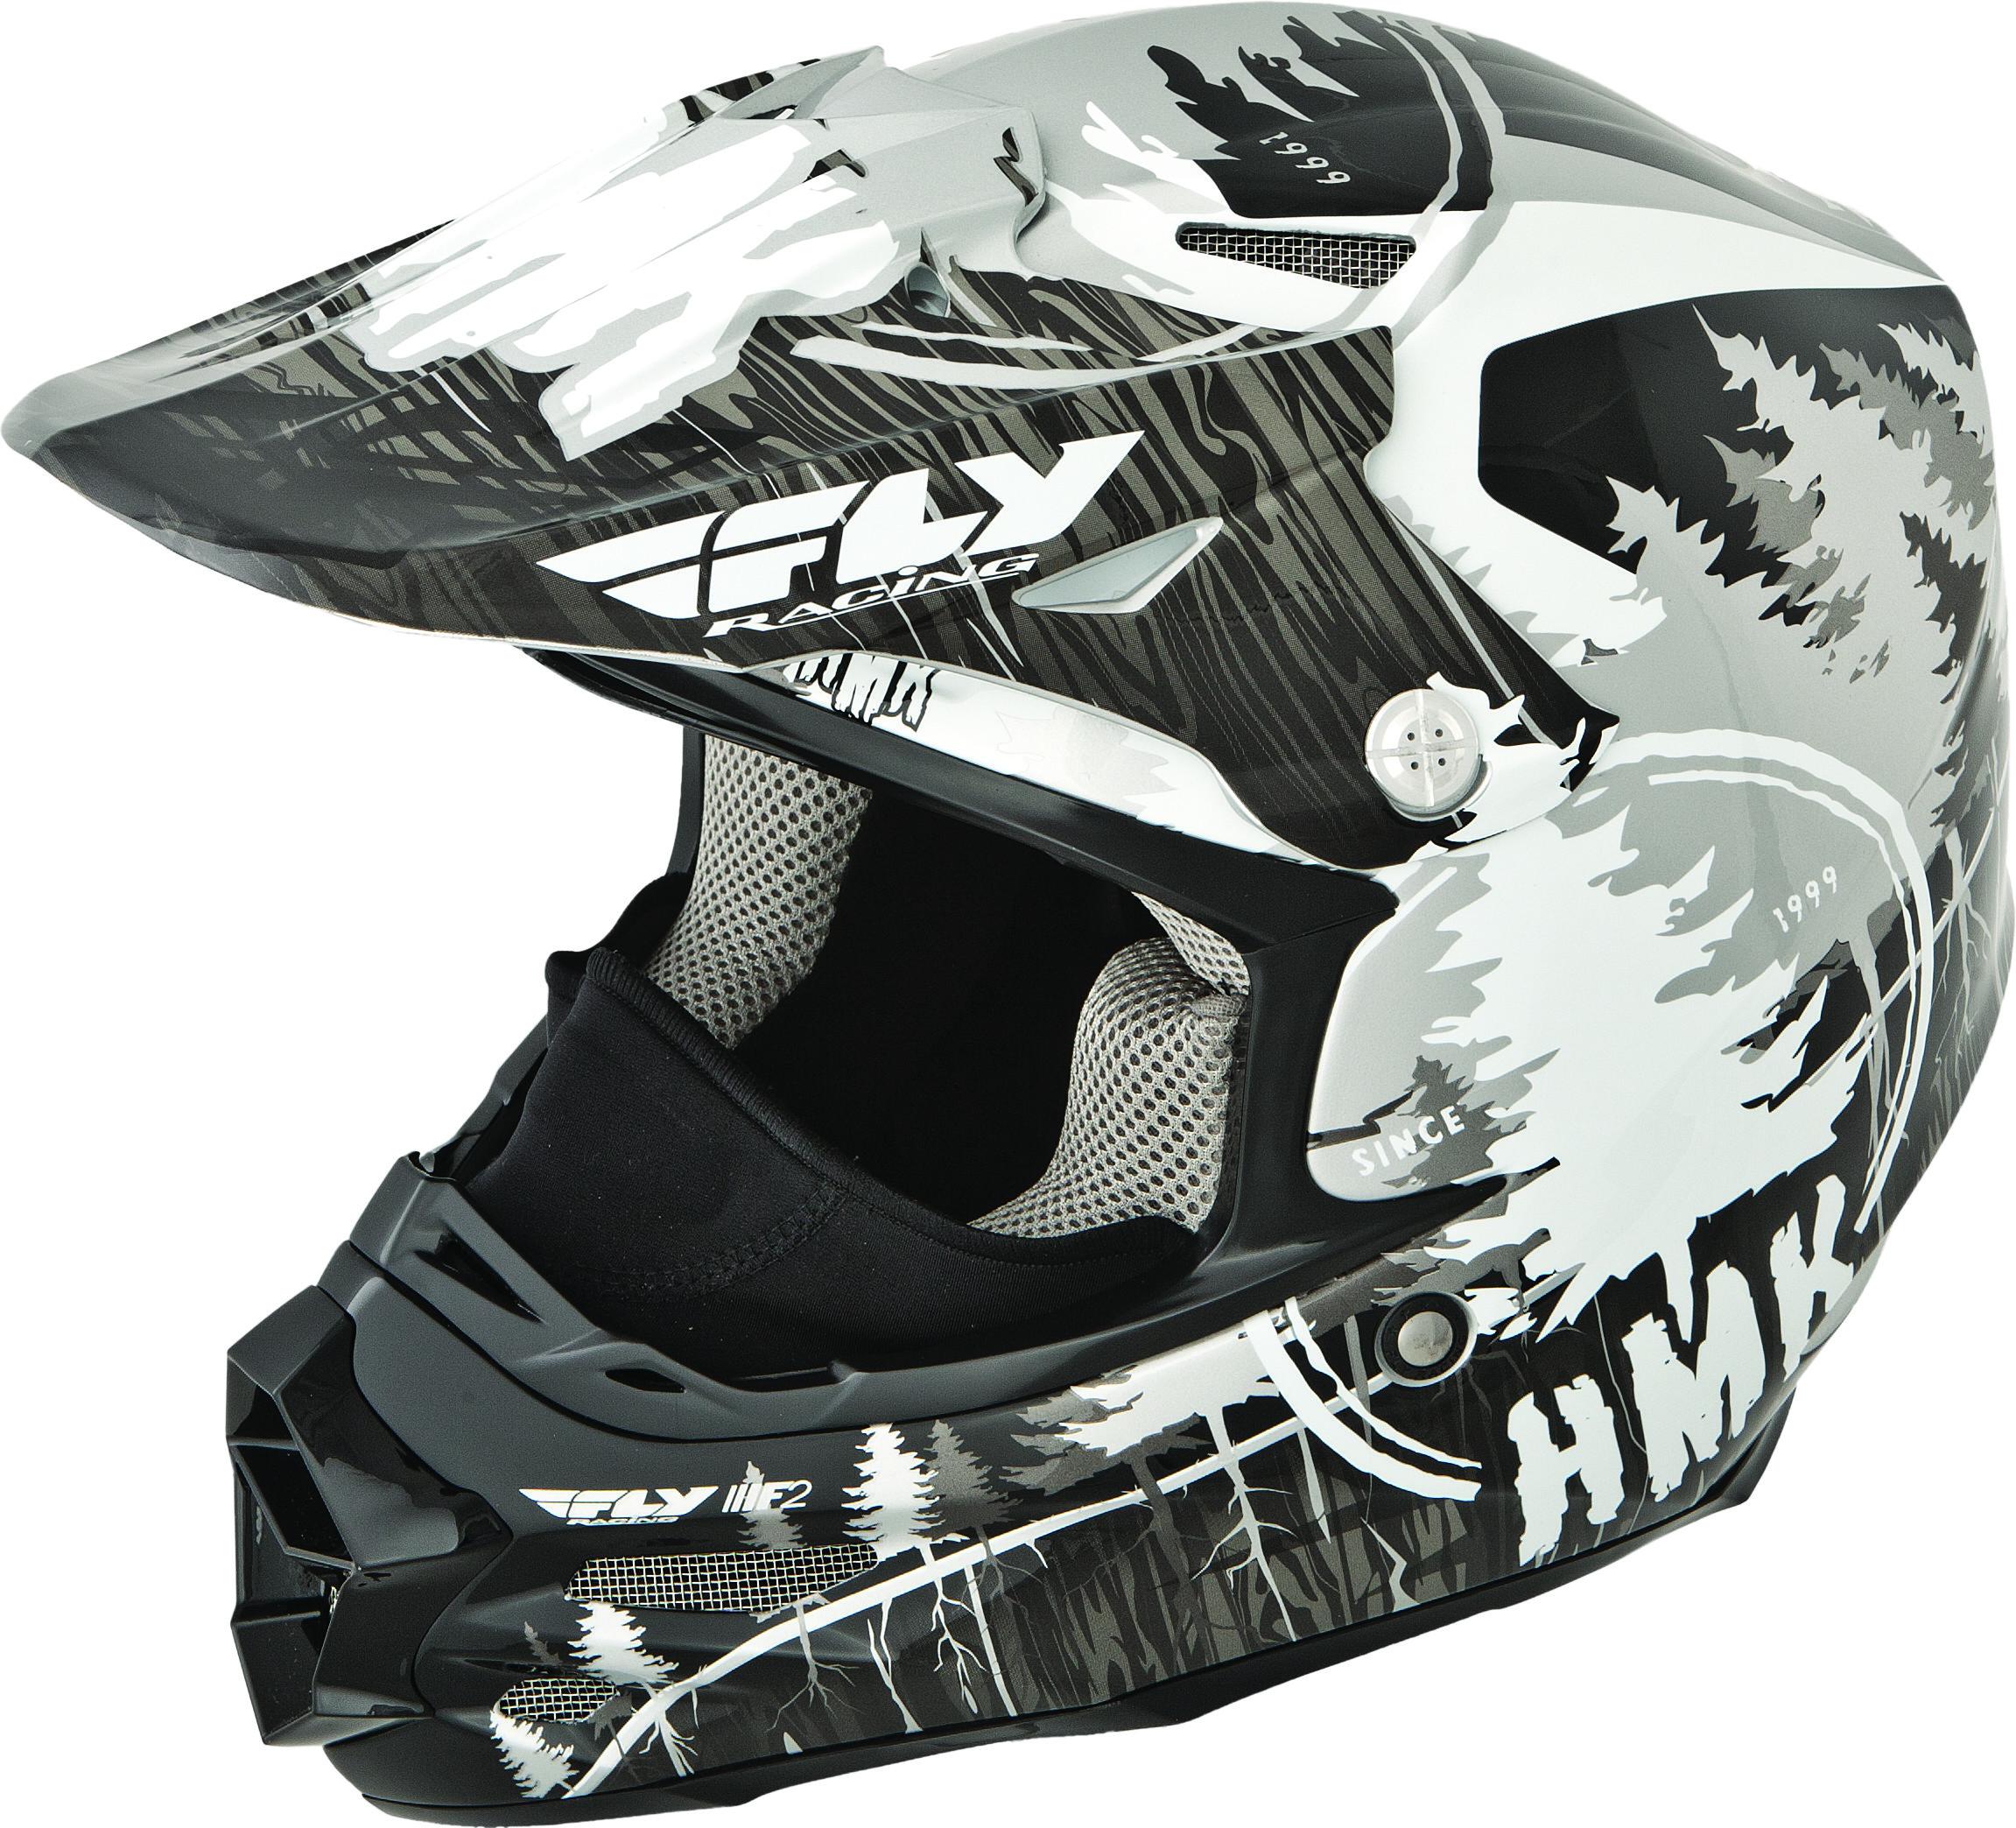 F2 Carbon Hmk Pro Stamp Helmet Black/White S